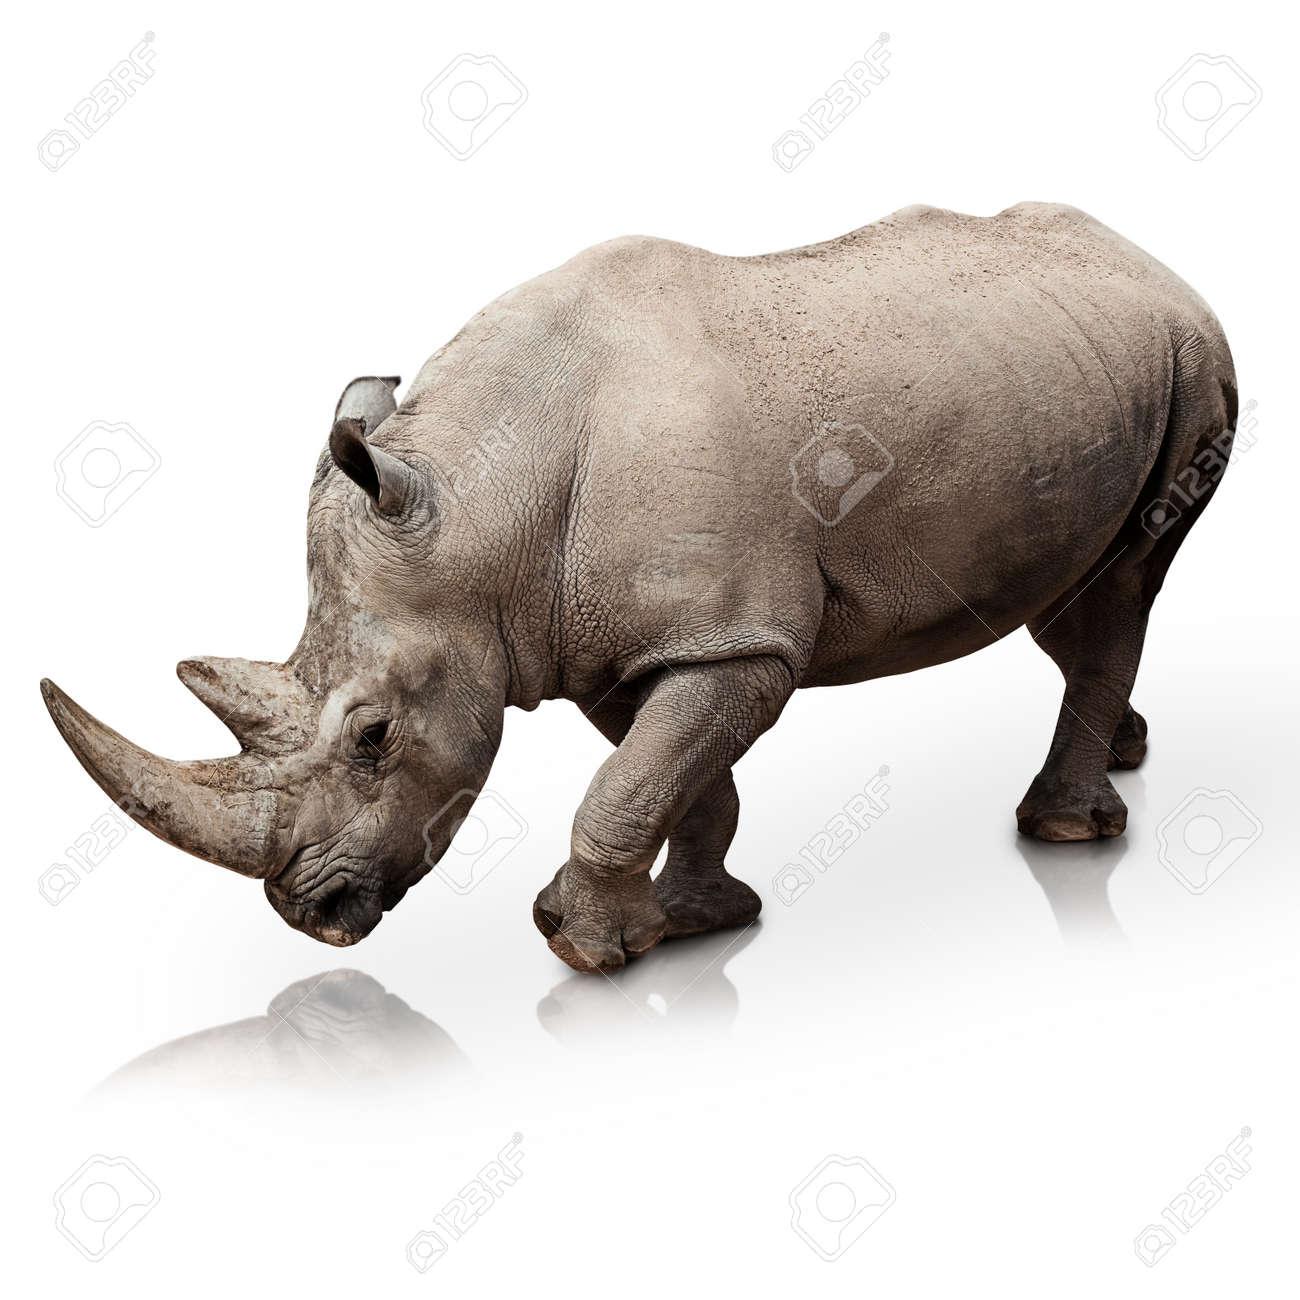 wild rhinoceros walking on a reflective surface Stock Photo - 10374020